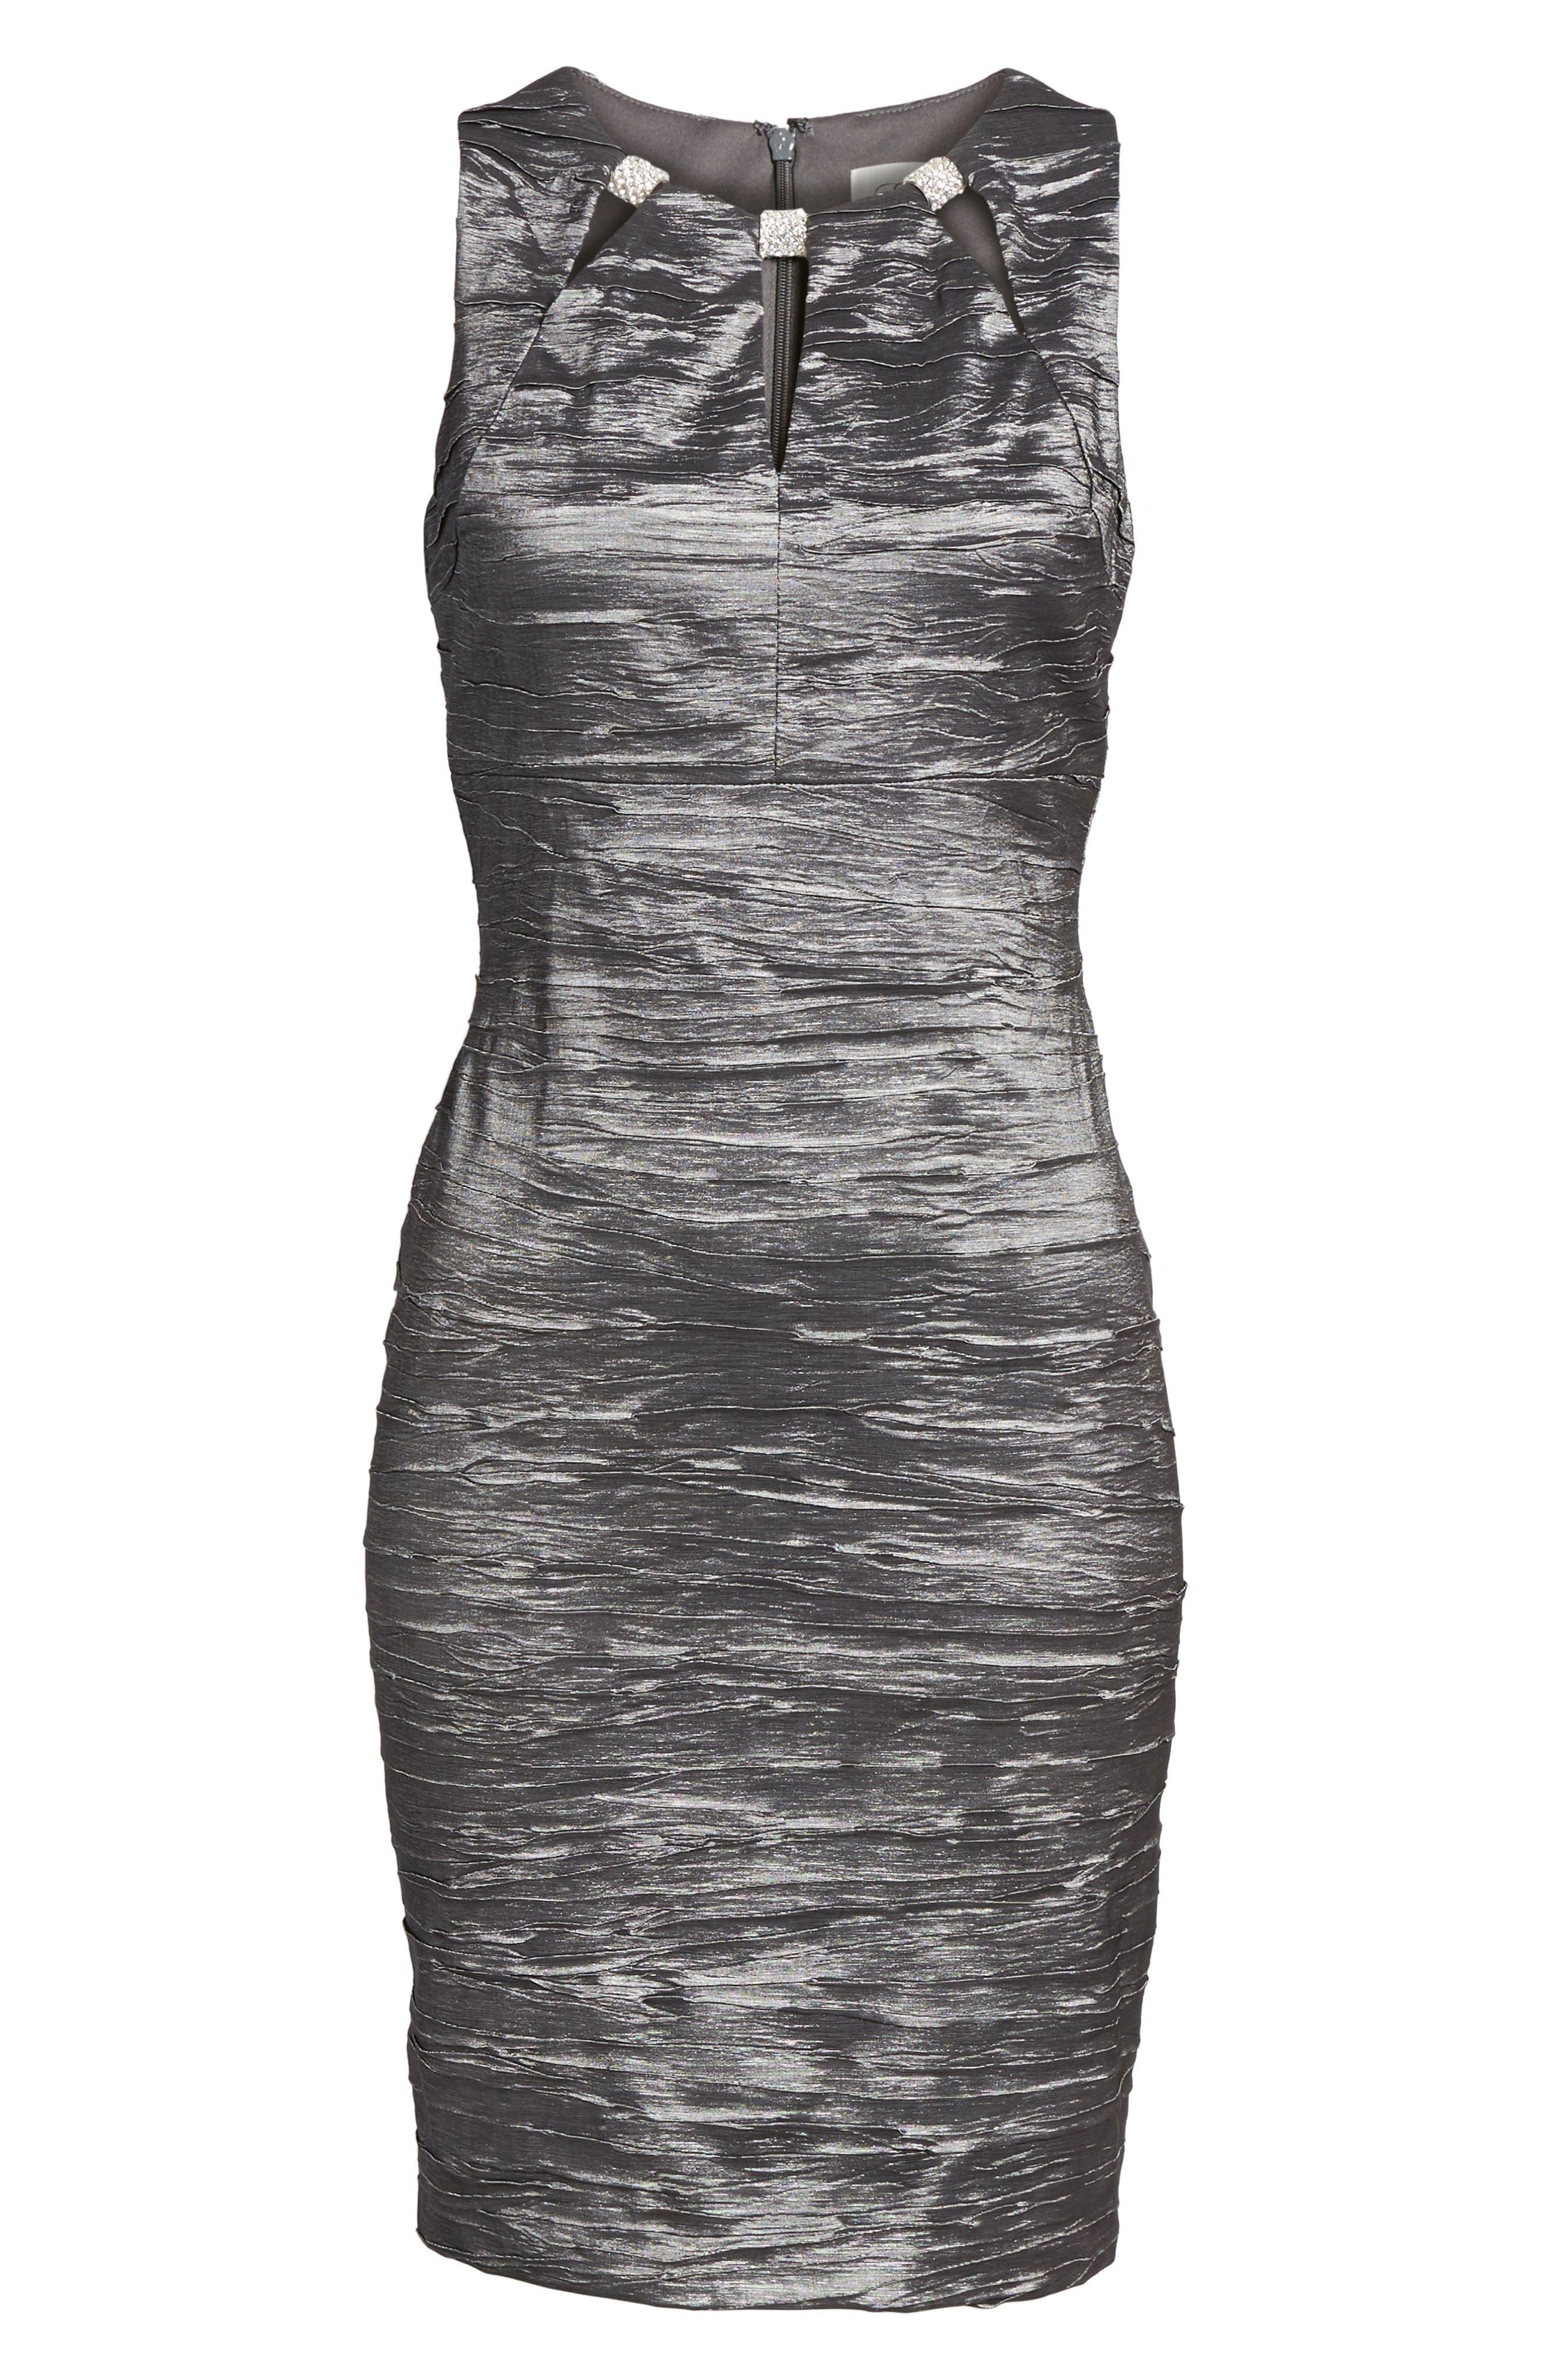 Embellished Cutout Taffeta Sheath Dress,                             Alternate thumbnail 8, color,                             CHARCOAL